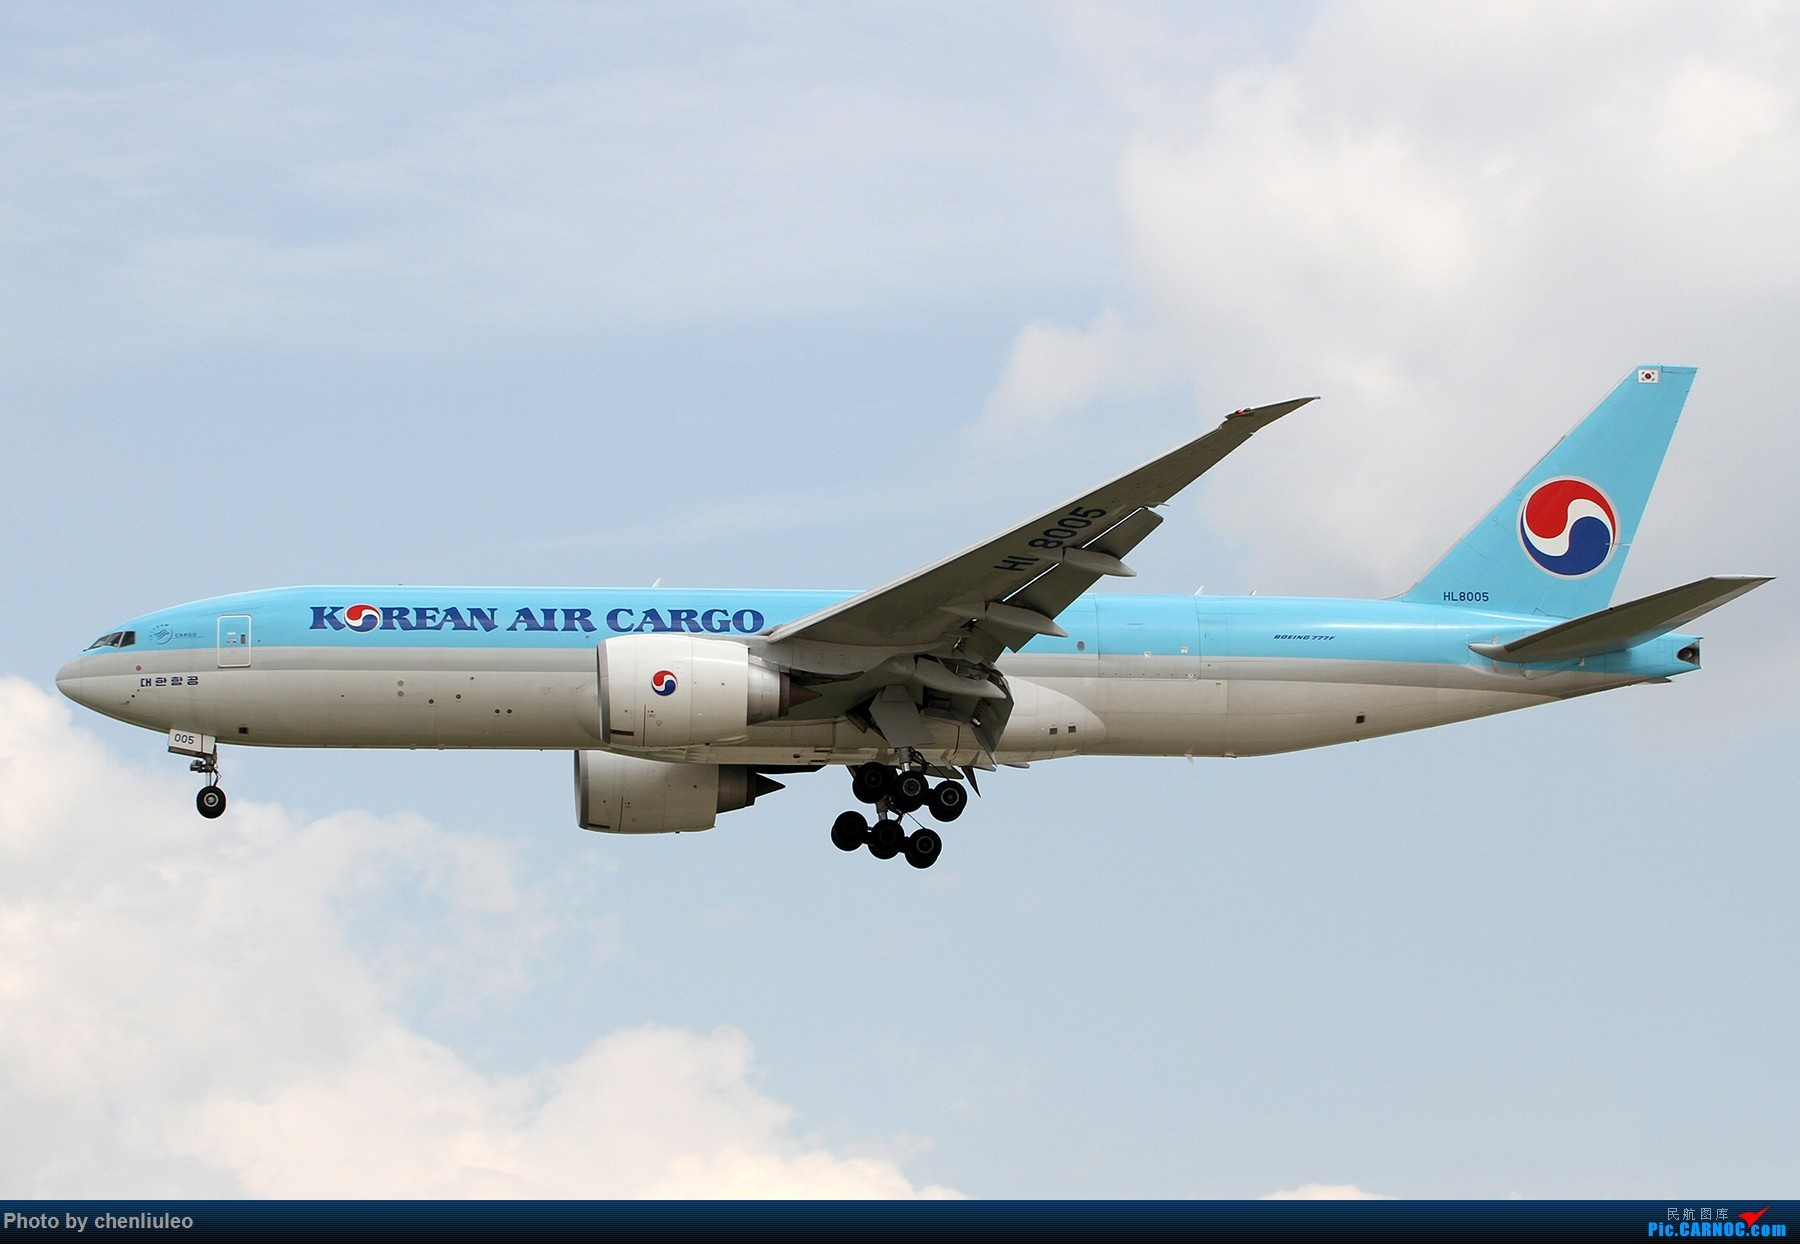 Re:[原创]【北美飞友会】芝加哥奥黑尔机场首拍 BOEING 777F HL8005 美国芝加哥奥黑尔国际机场